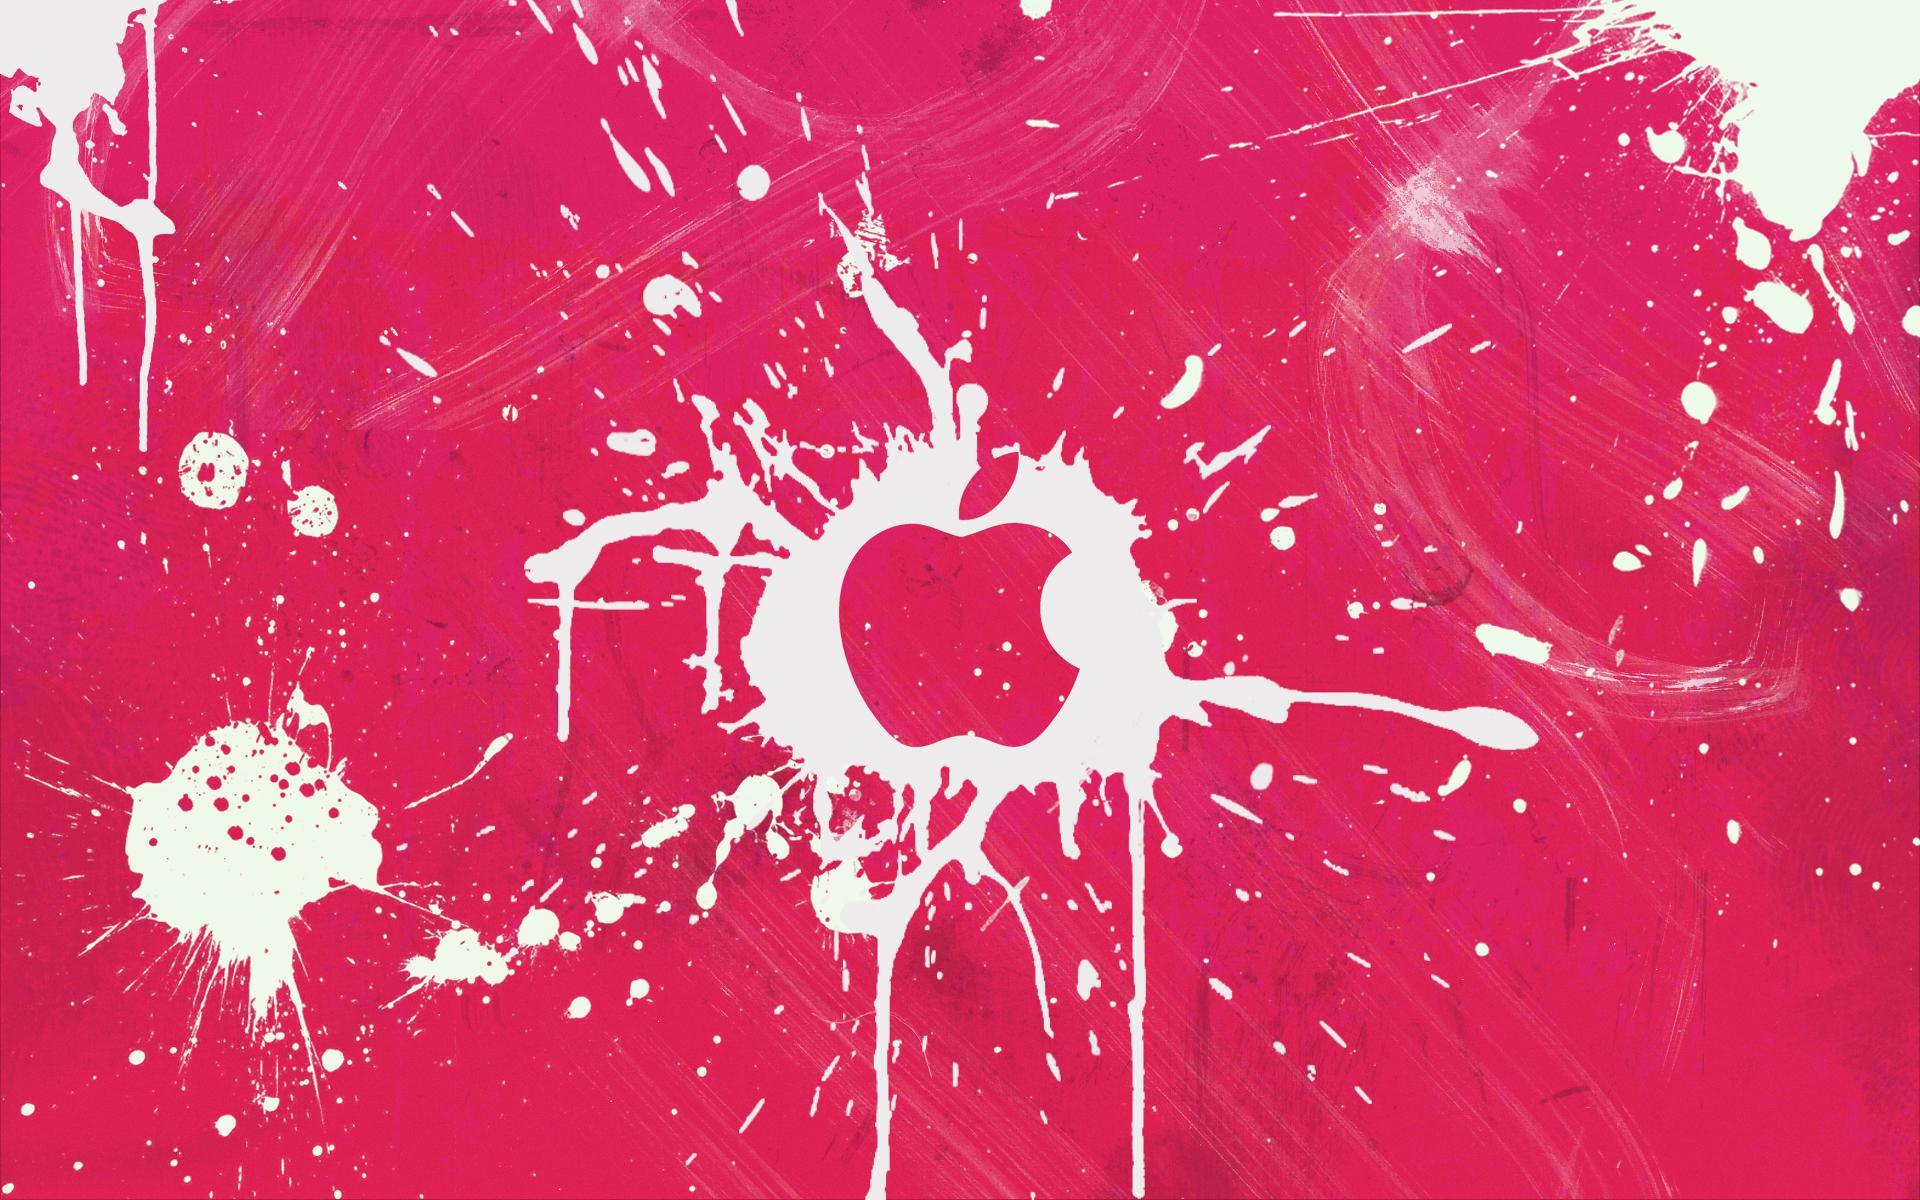 apple wallpaper desktop wallpapers pink windows mac 1920x1200